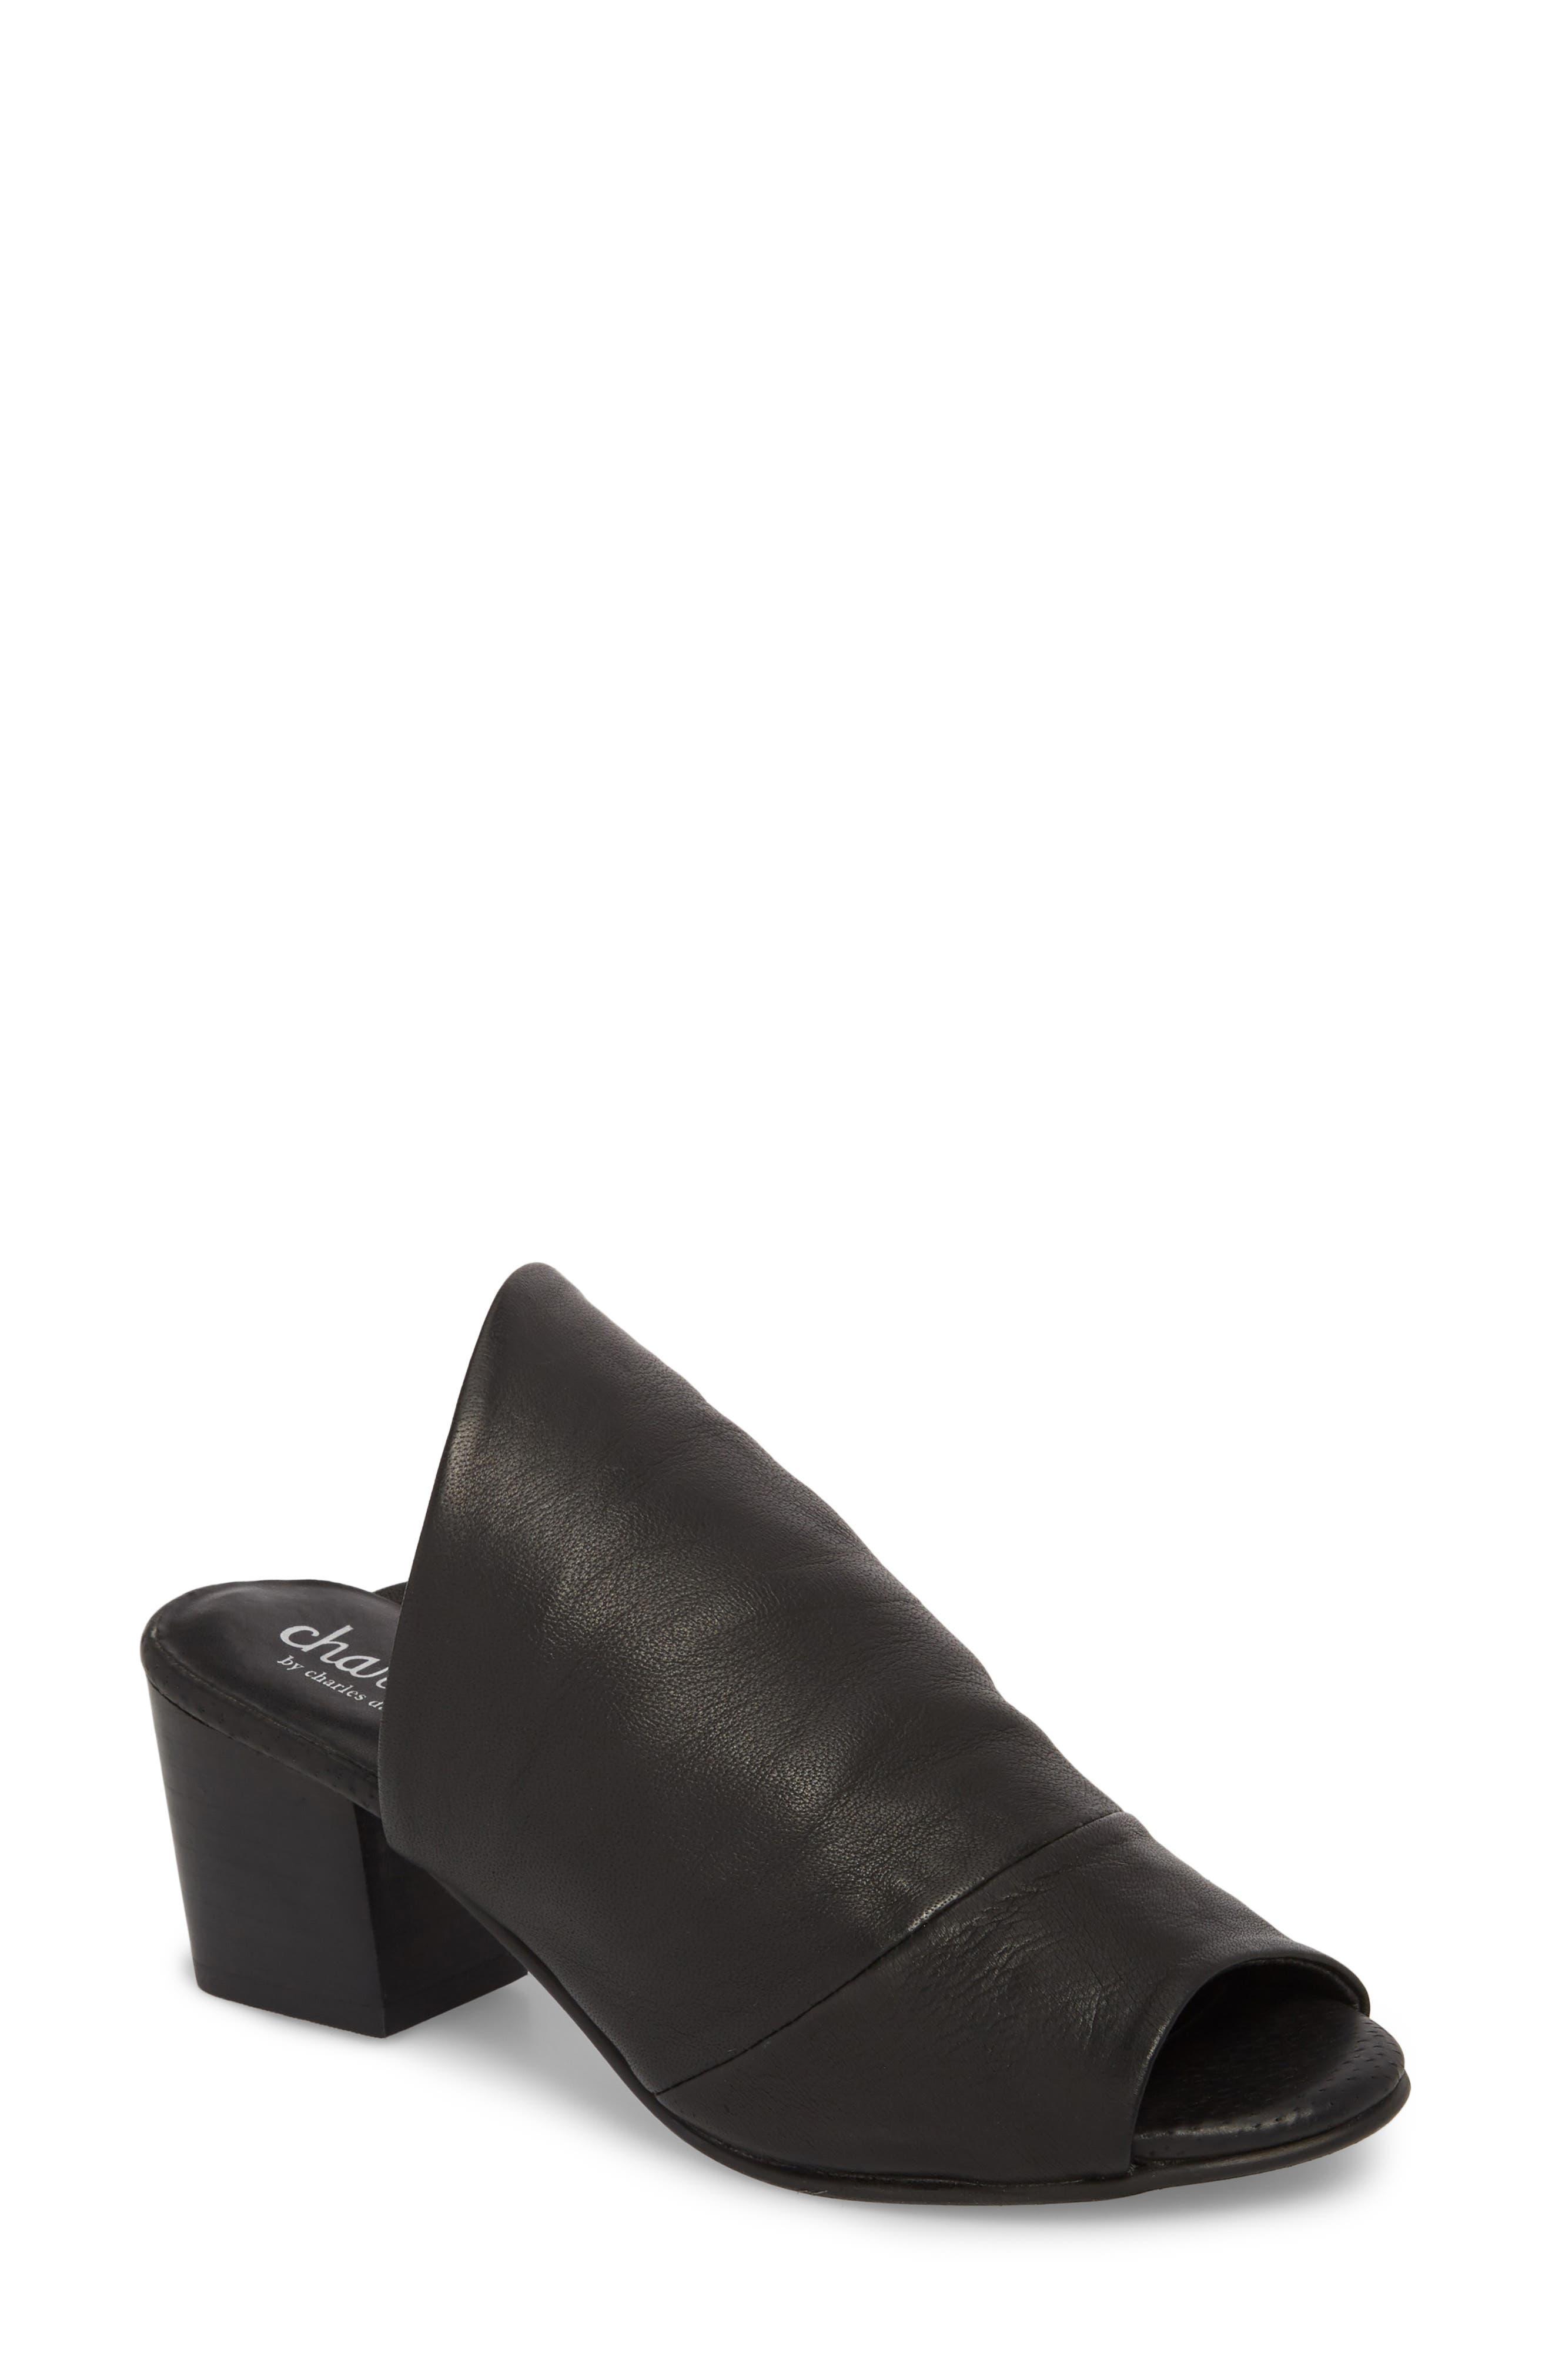 Yanna Block Heel Slide Sandal,                         Main,                         color, BLACK LEATHER